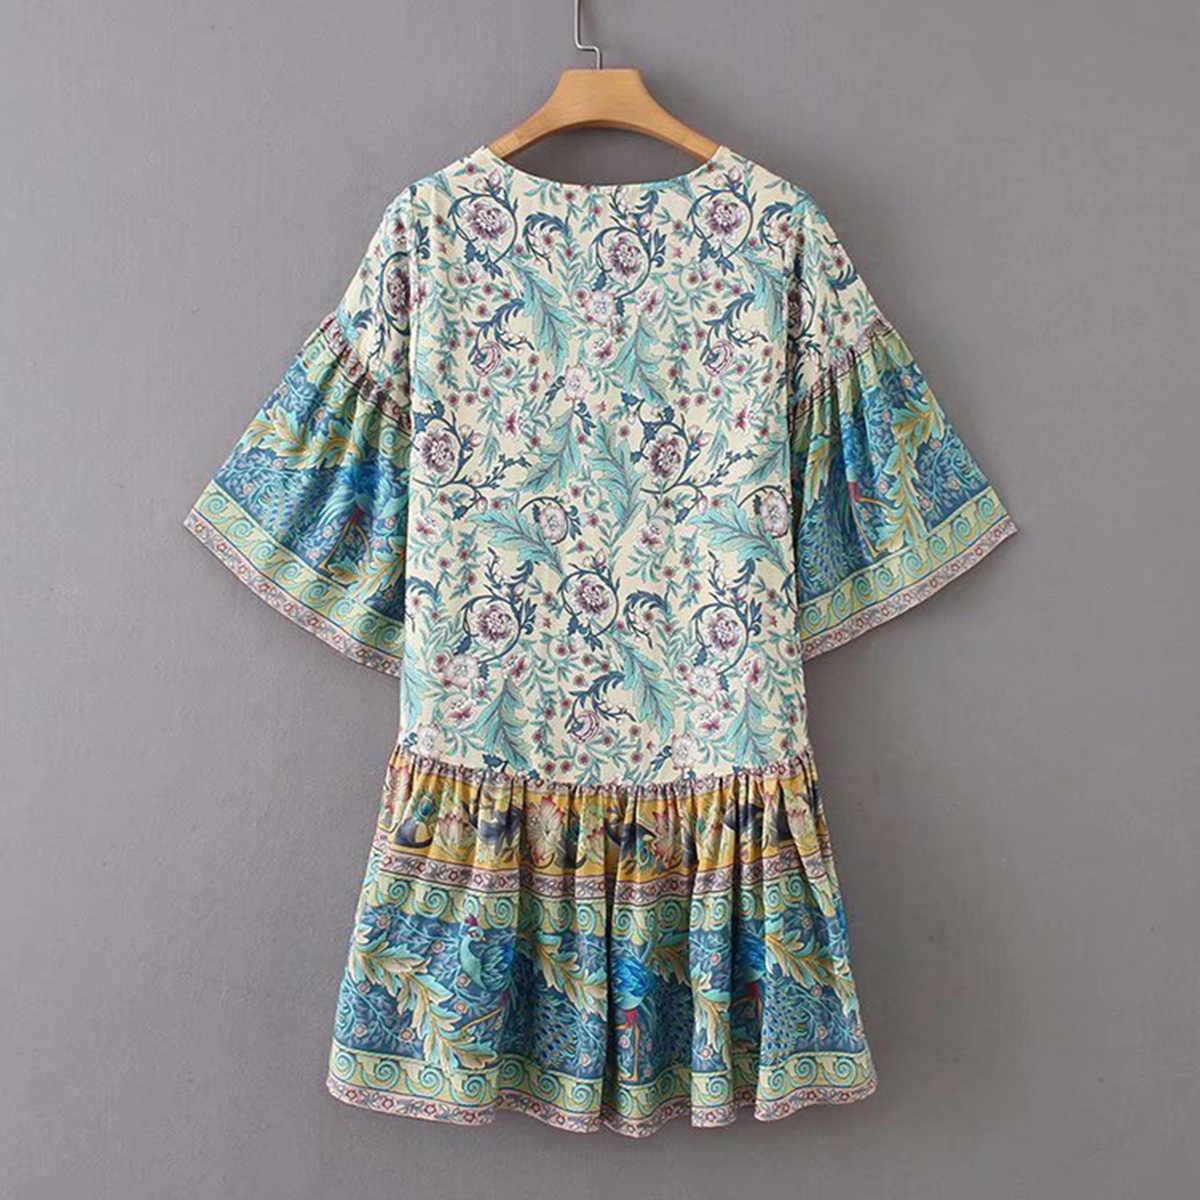 e23c8cffcace ... Jastie Gypsy Oasis Mini Dress Drop Waist Ruffle Hem Boho Beach Dresses  Pleated Sleeve Casual Women